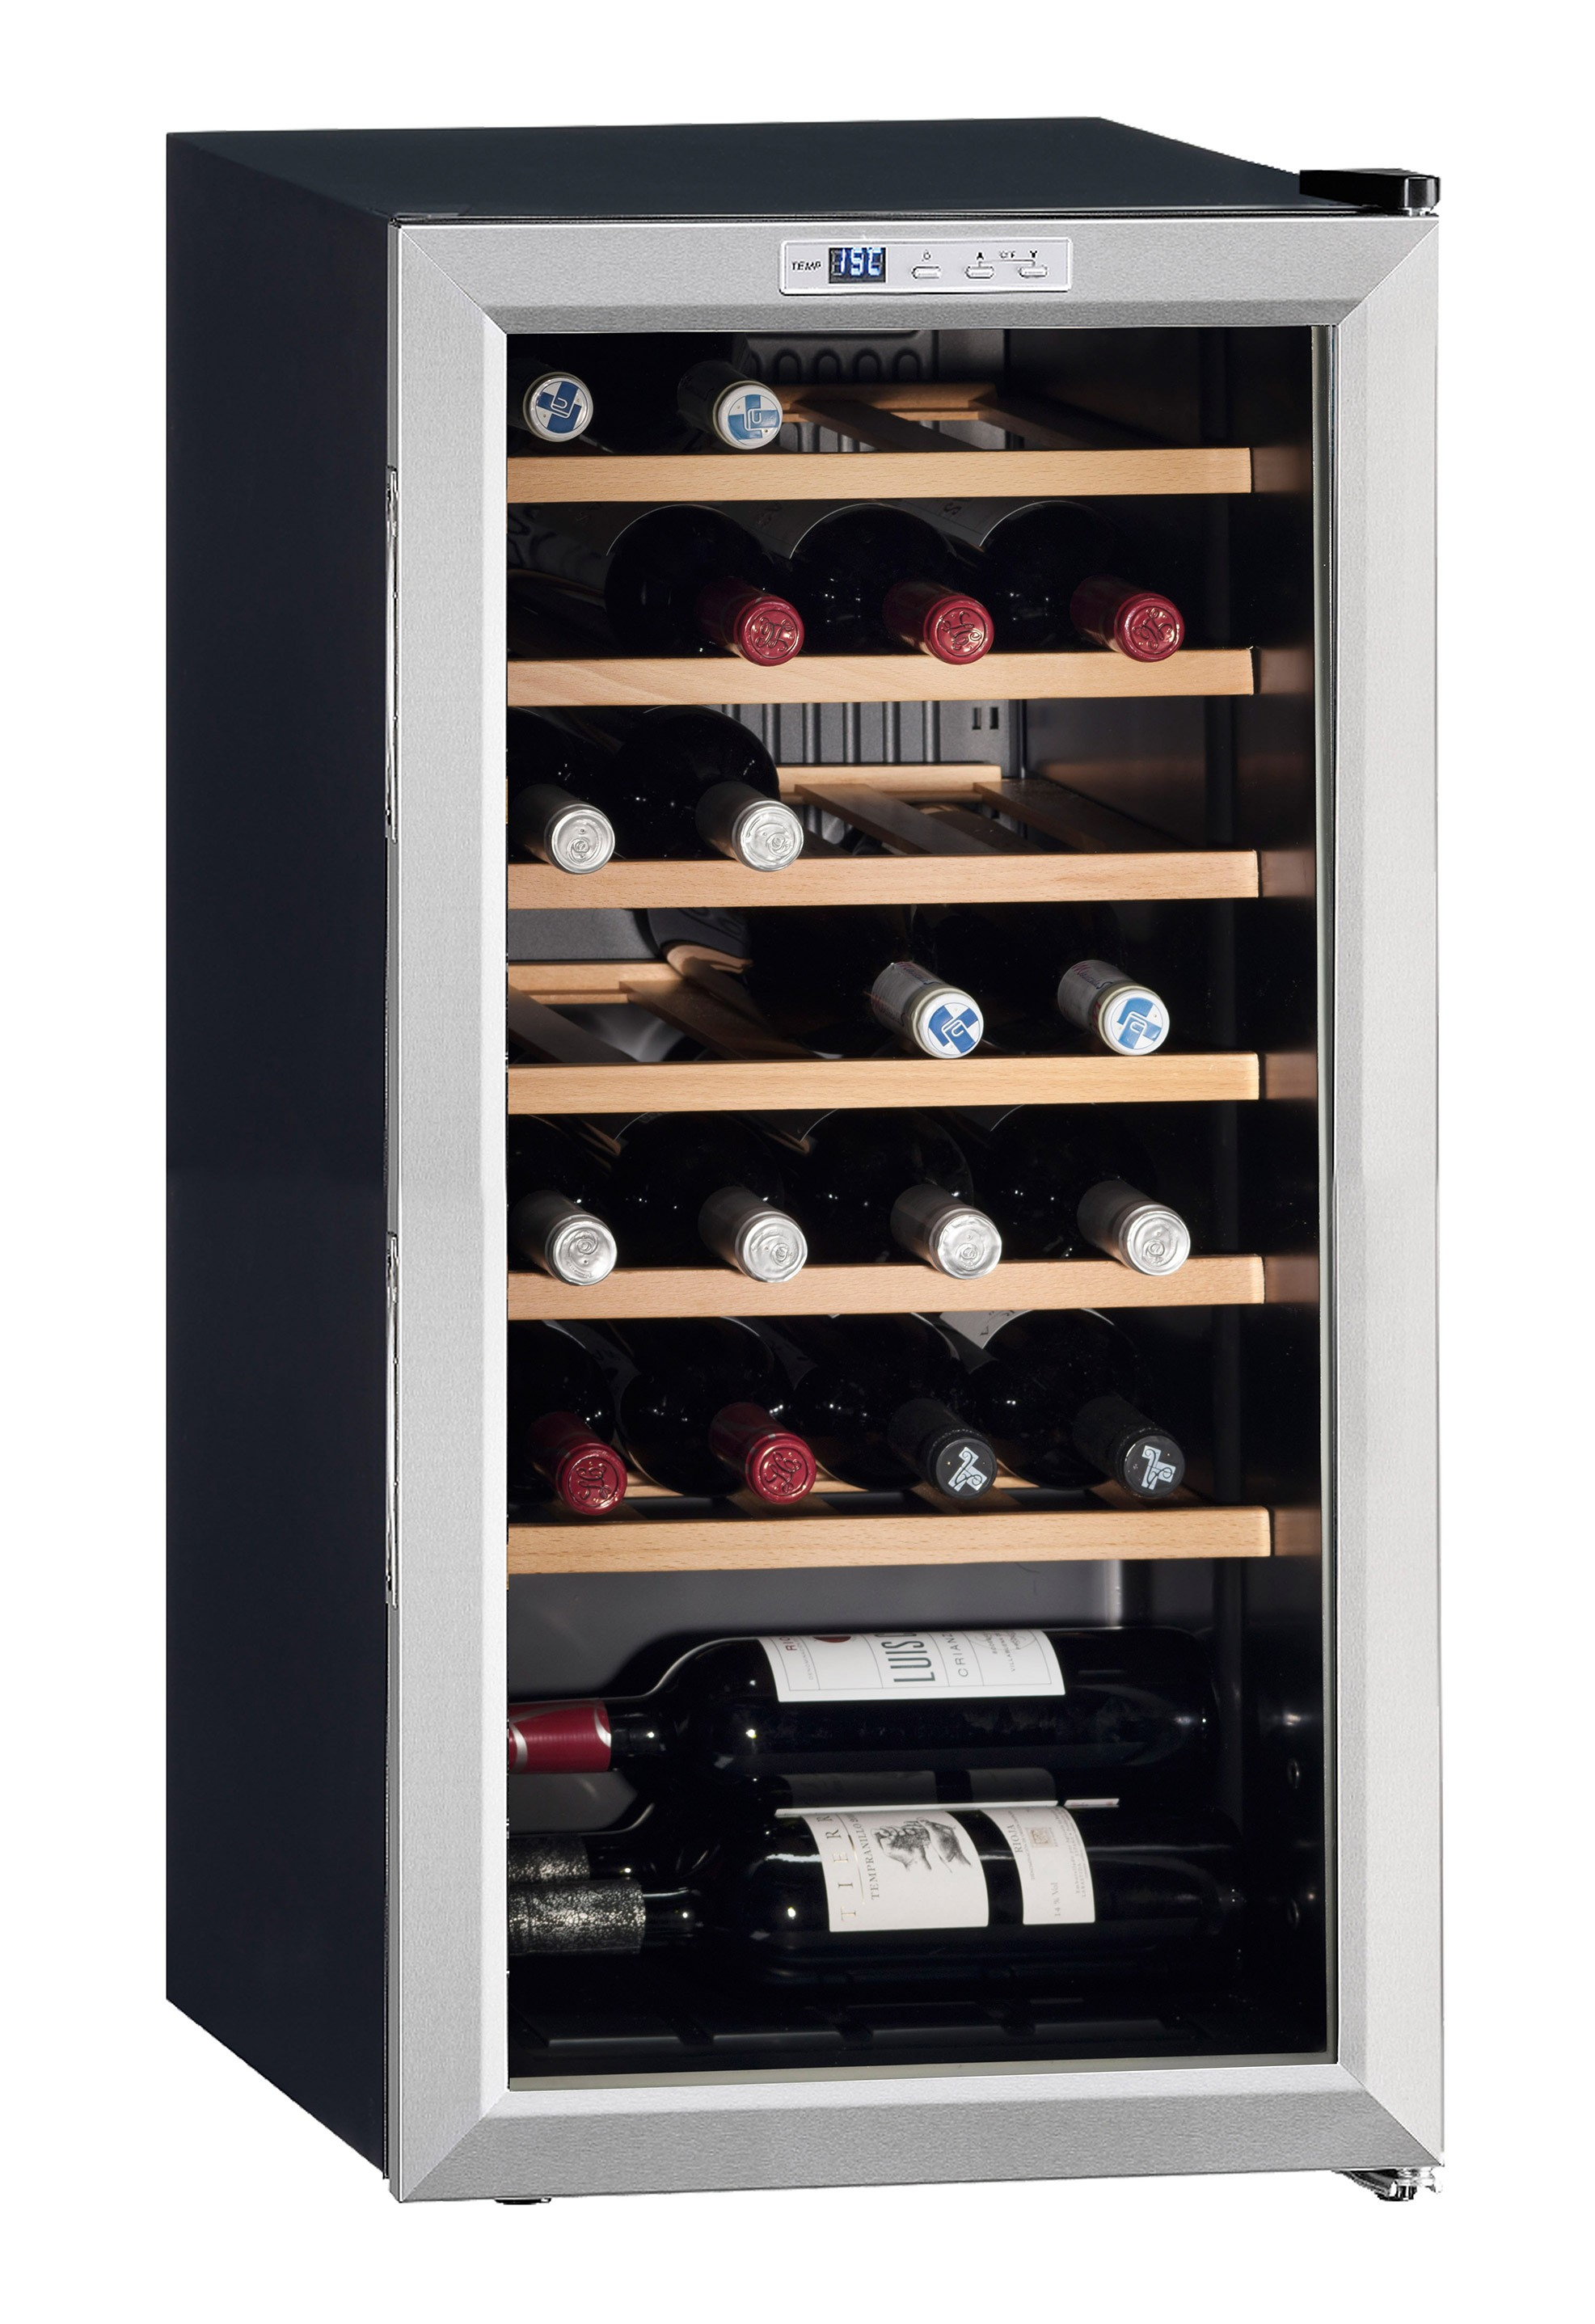 Vinoteca monotemperatura para 28 botellas innobar - Fotos de vinotecas ...